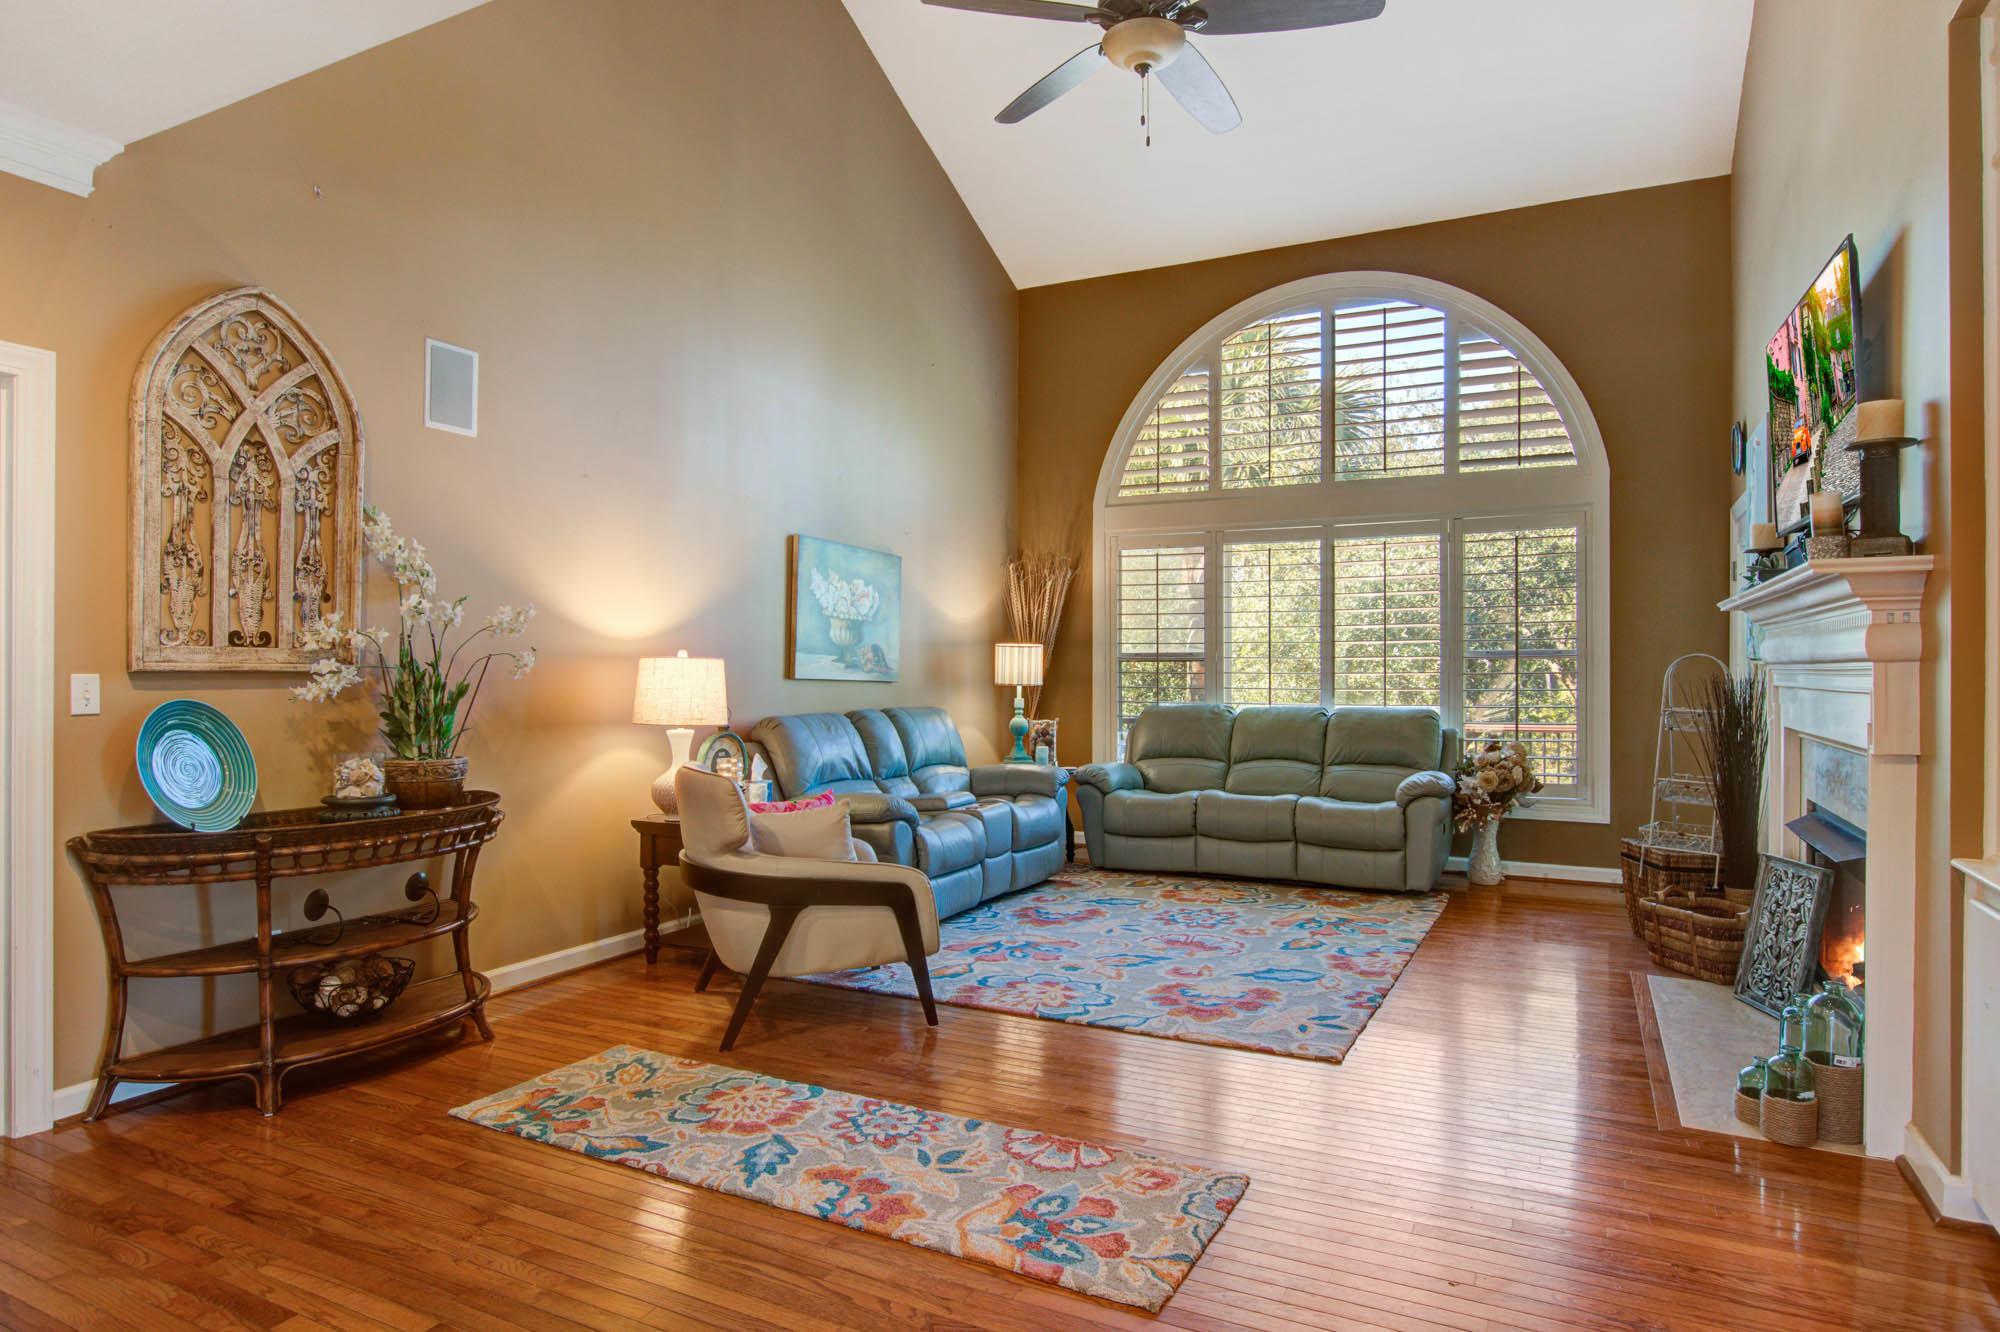 St Thomas Point Homes For Sale - 307 Jamesbury, Charleston, SC - 38